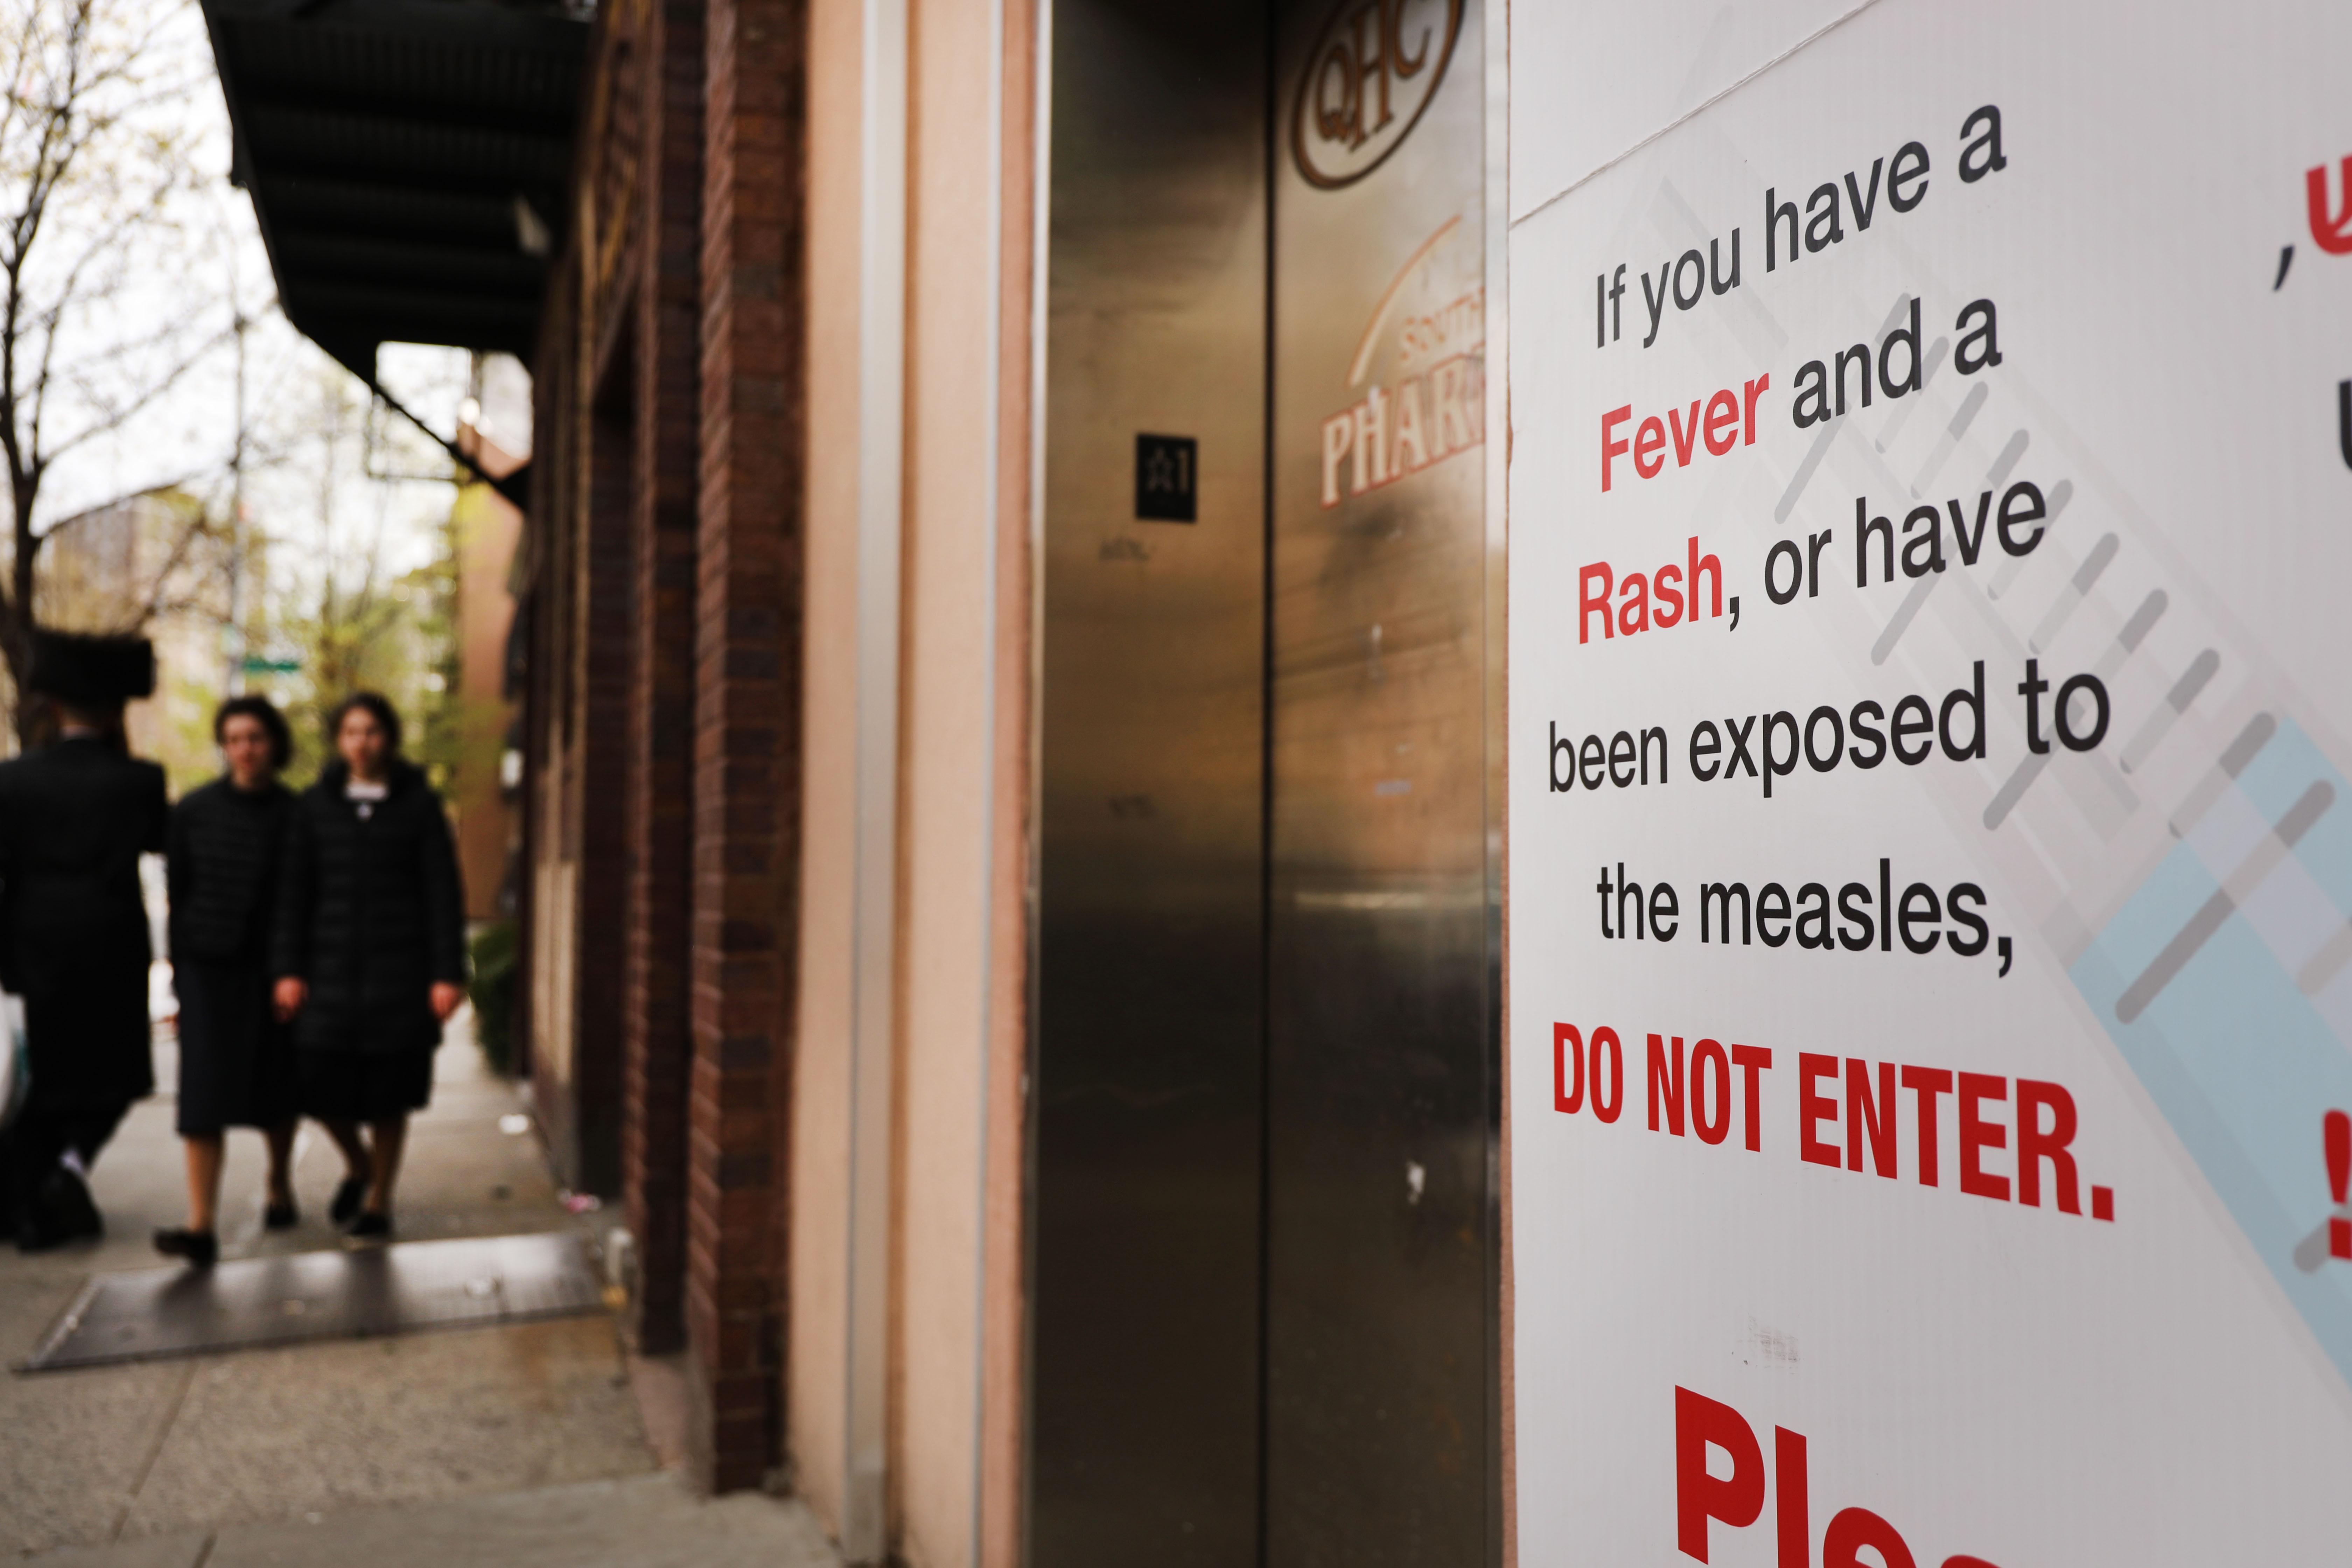 Scientology measles